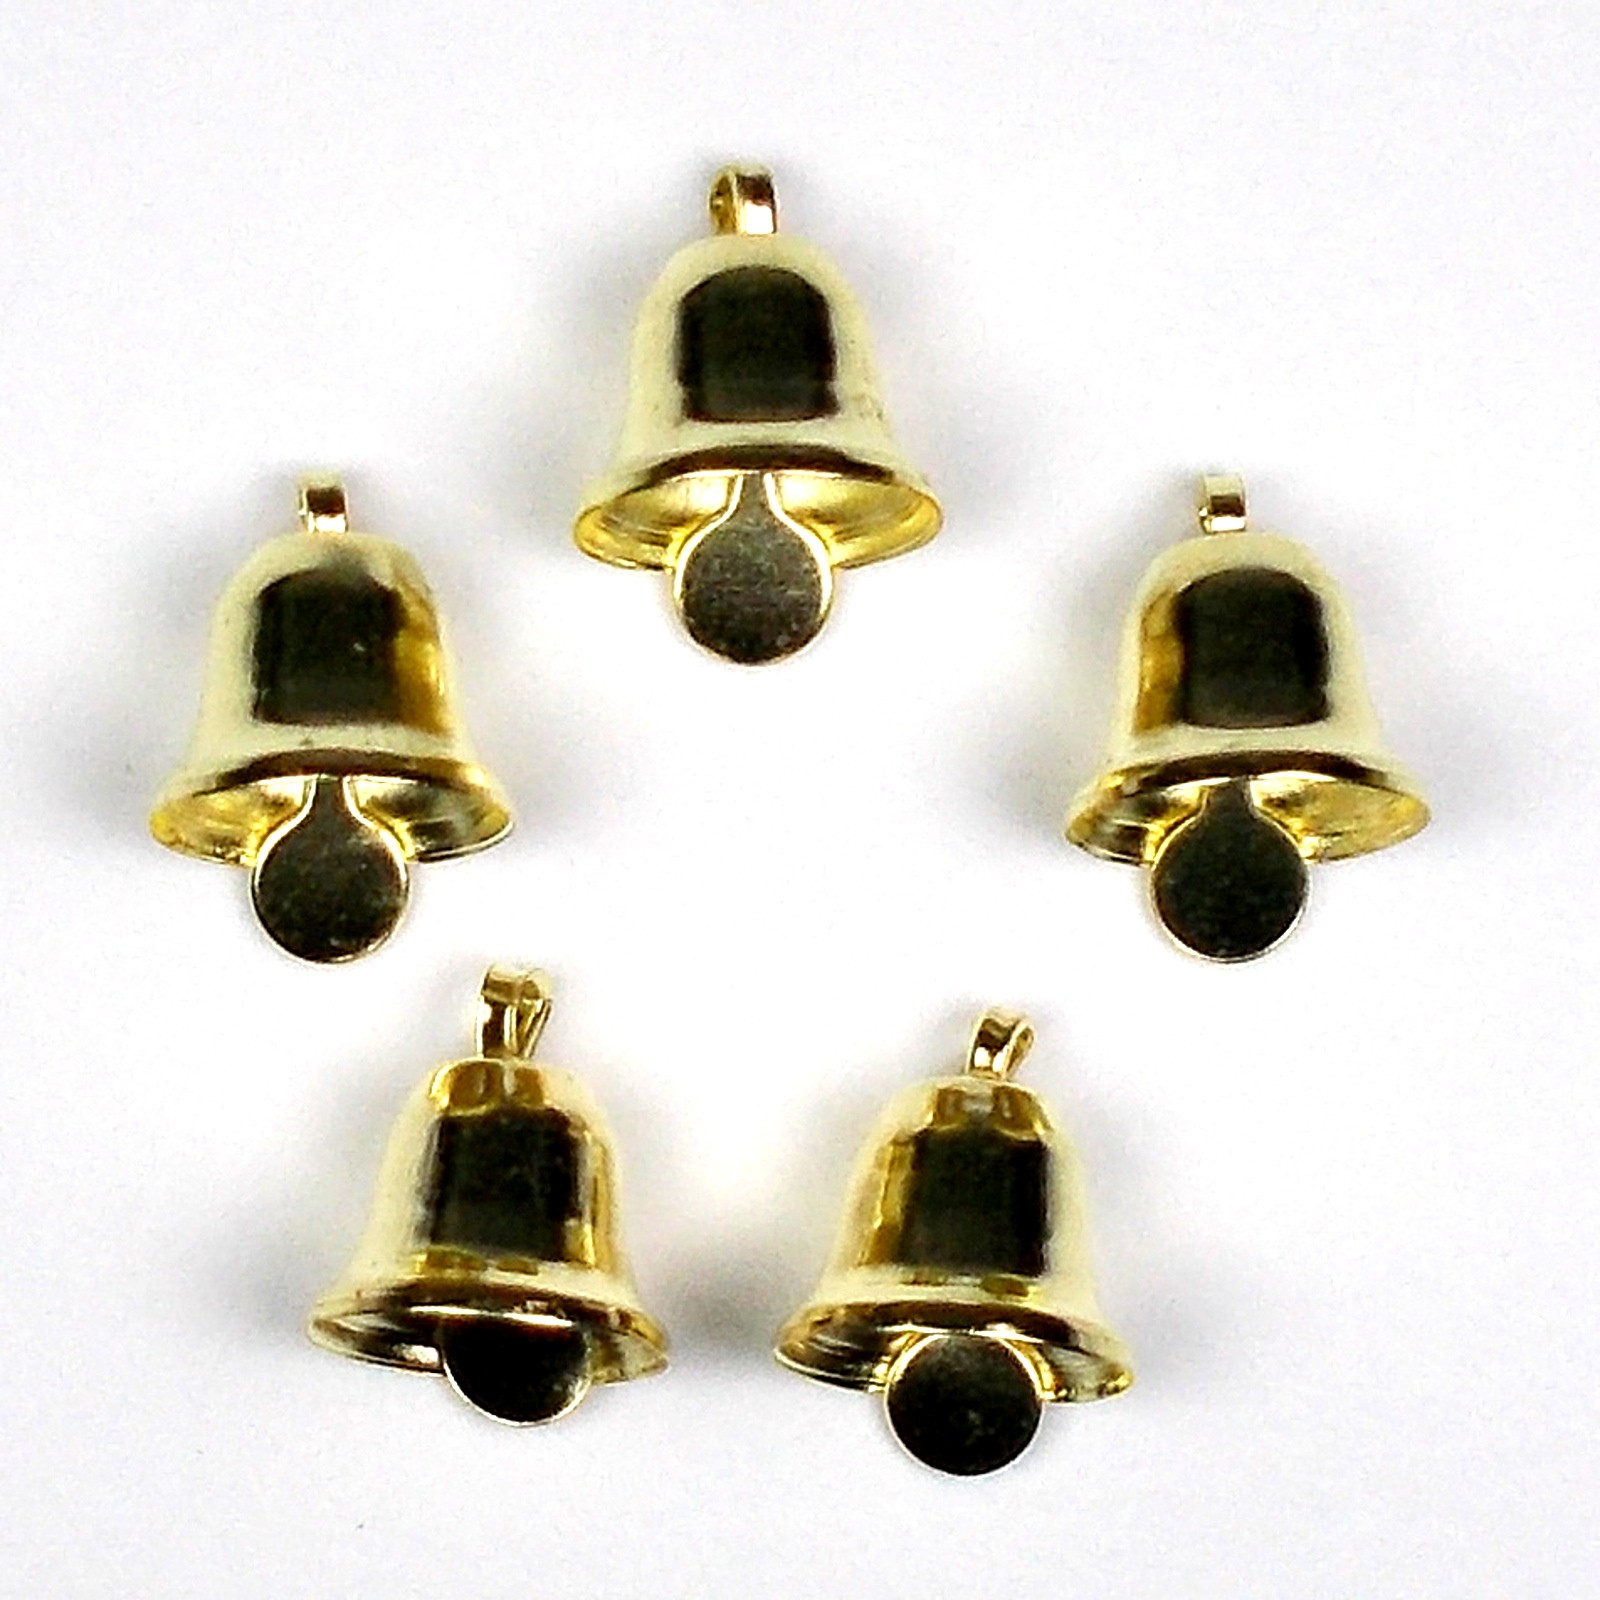 Mini Liberty Bells Gold 14mm Pack of 5